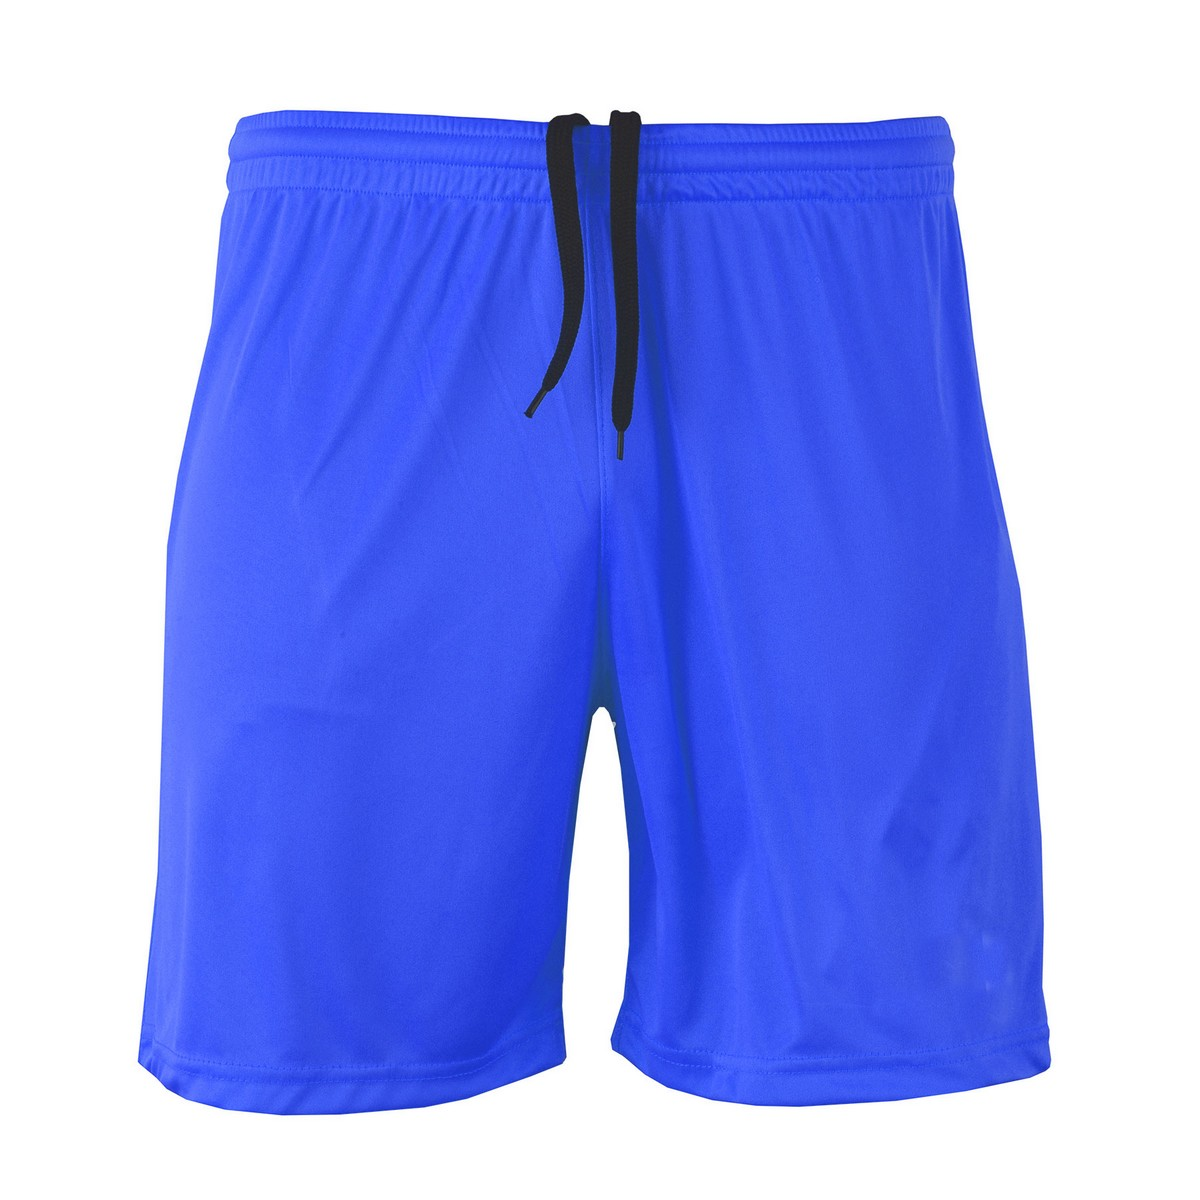 Men's Performance Running Sports Shorts Gym Fitness Football Short